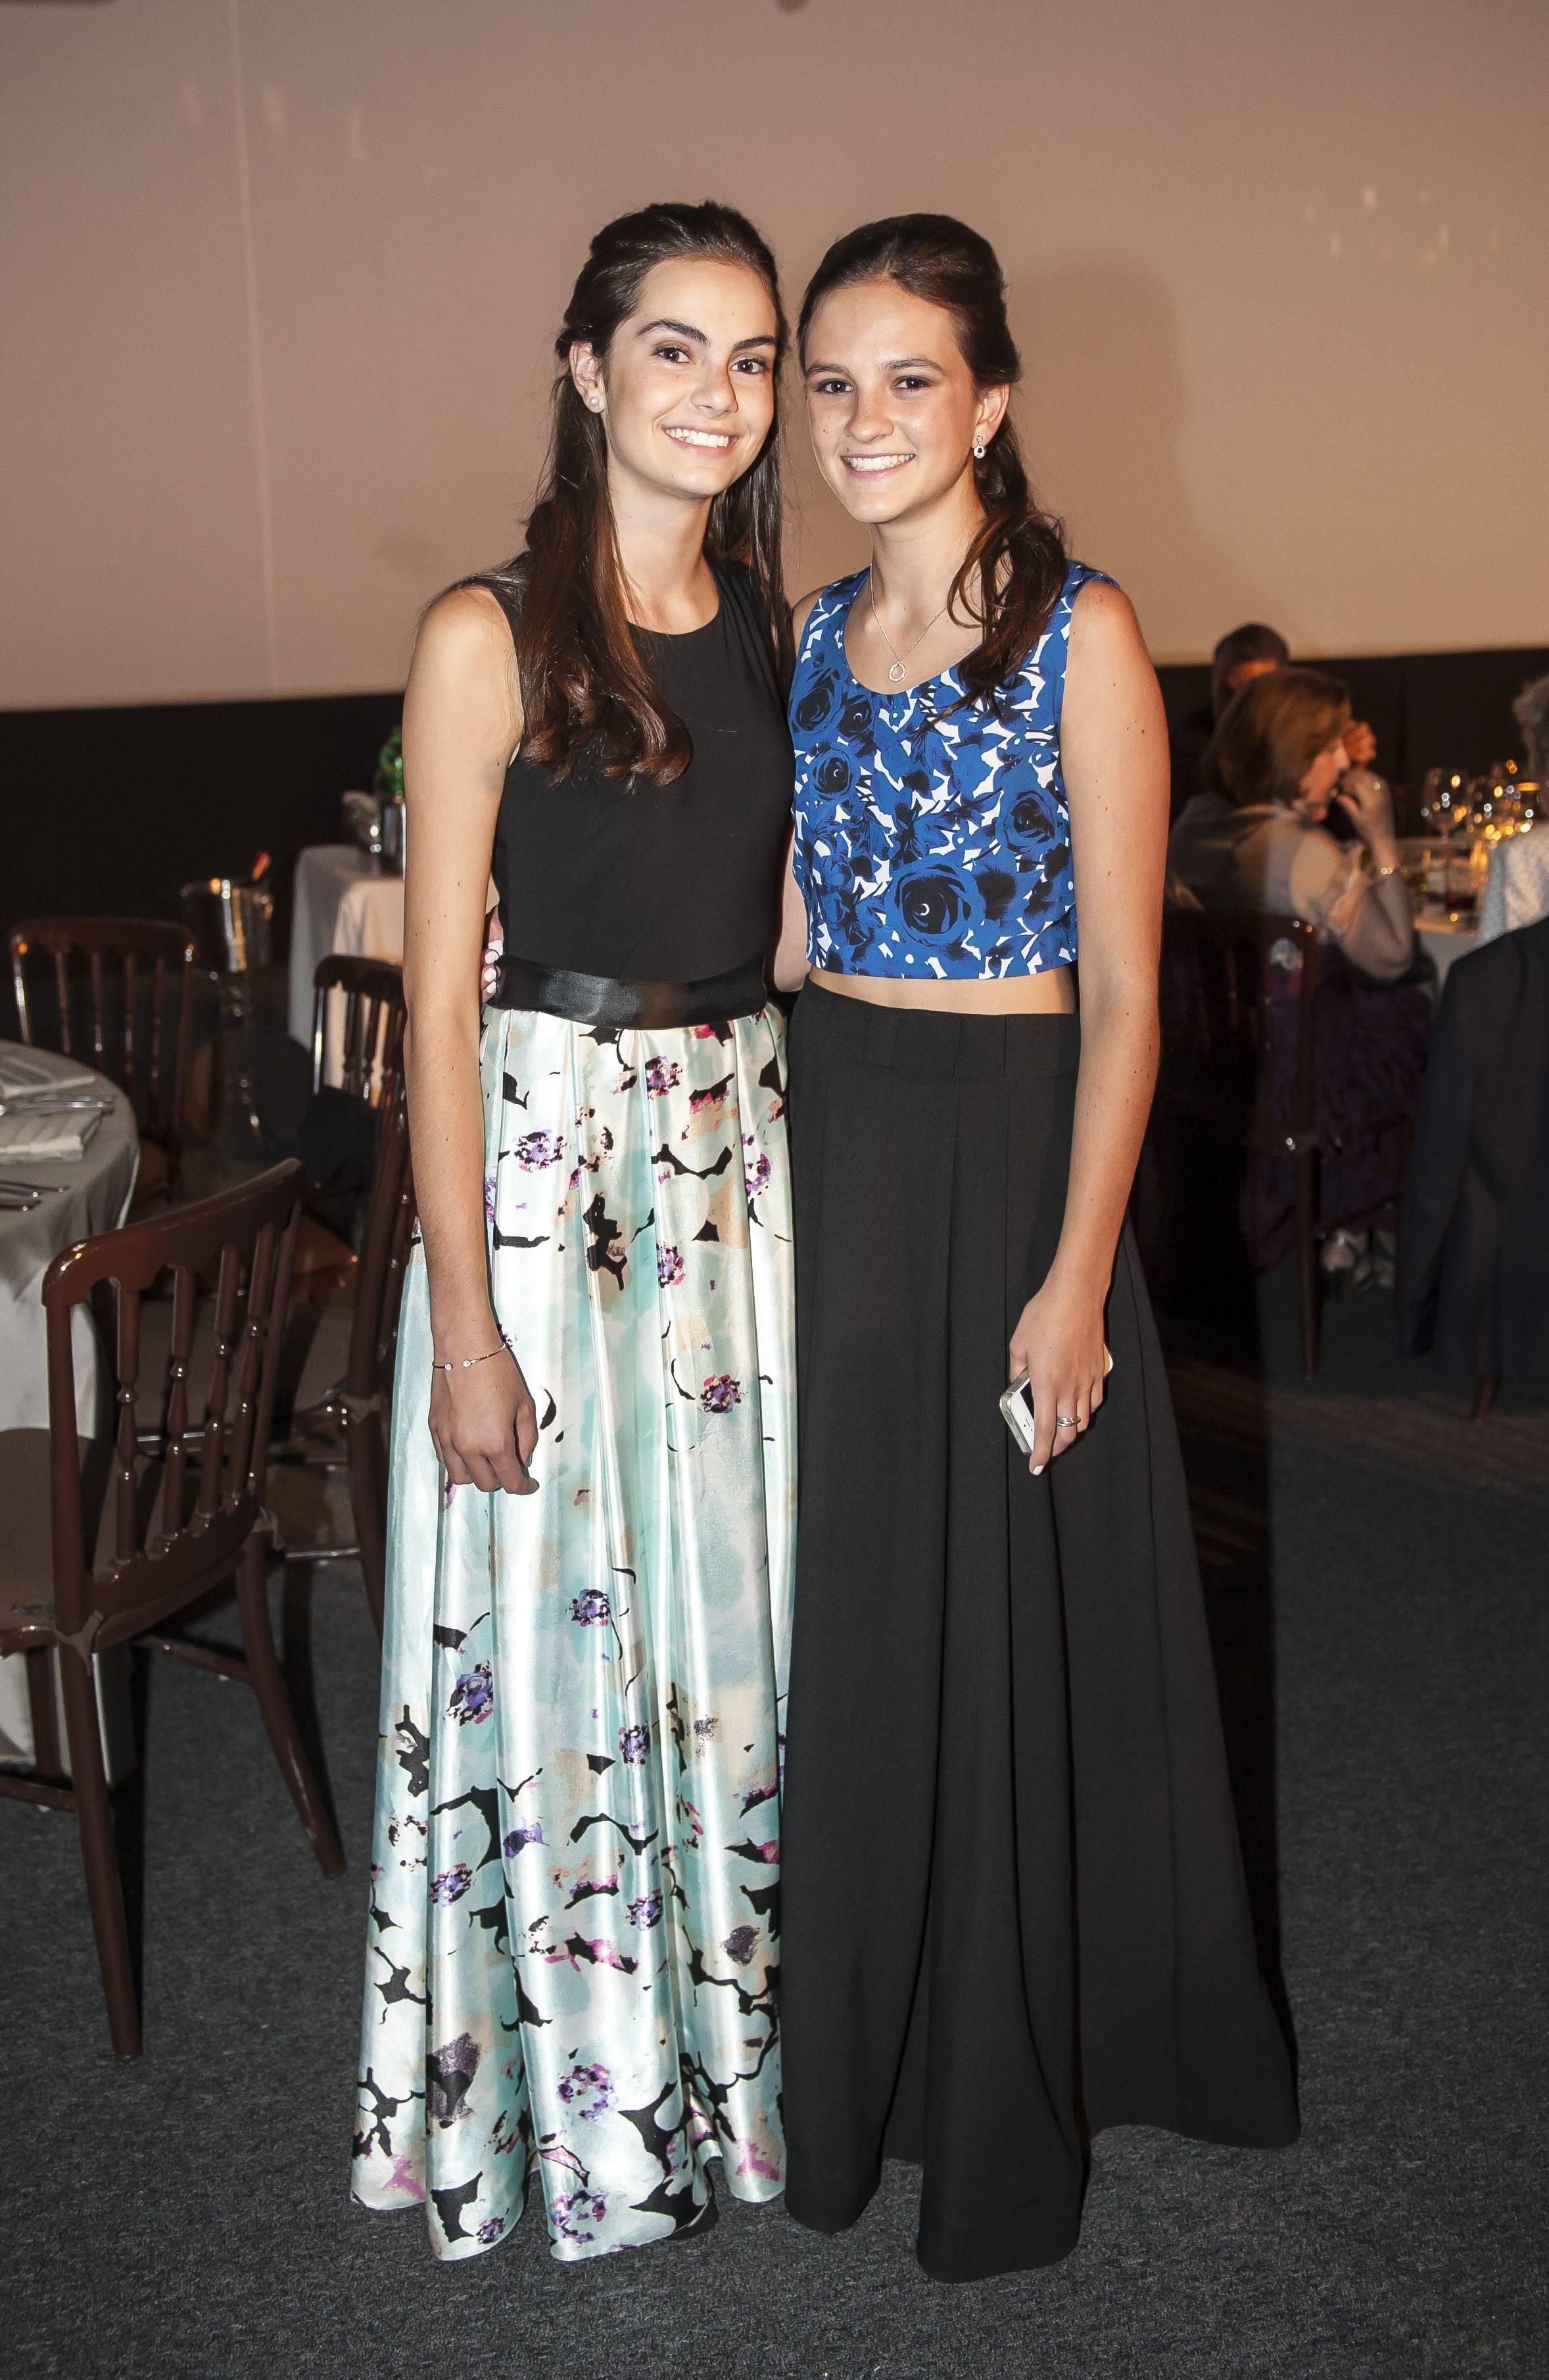 Macarena Gutiérrez y María Martínez JDS